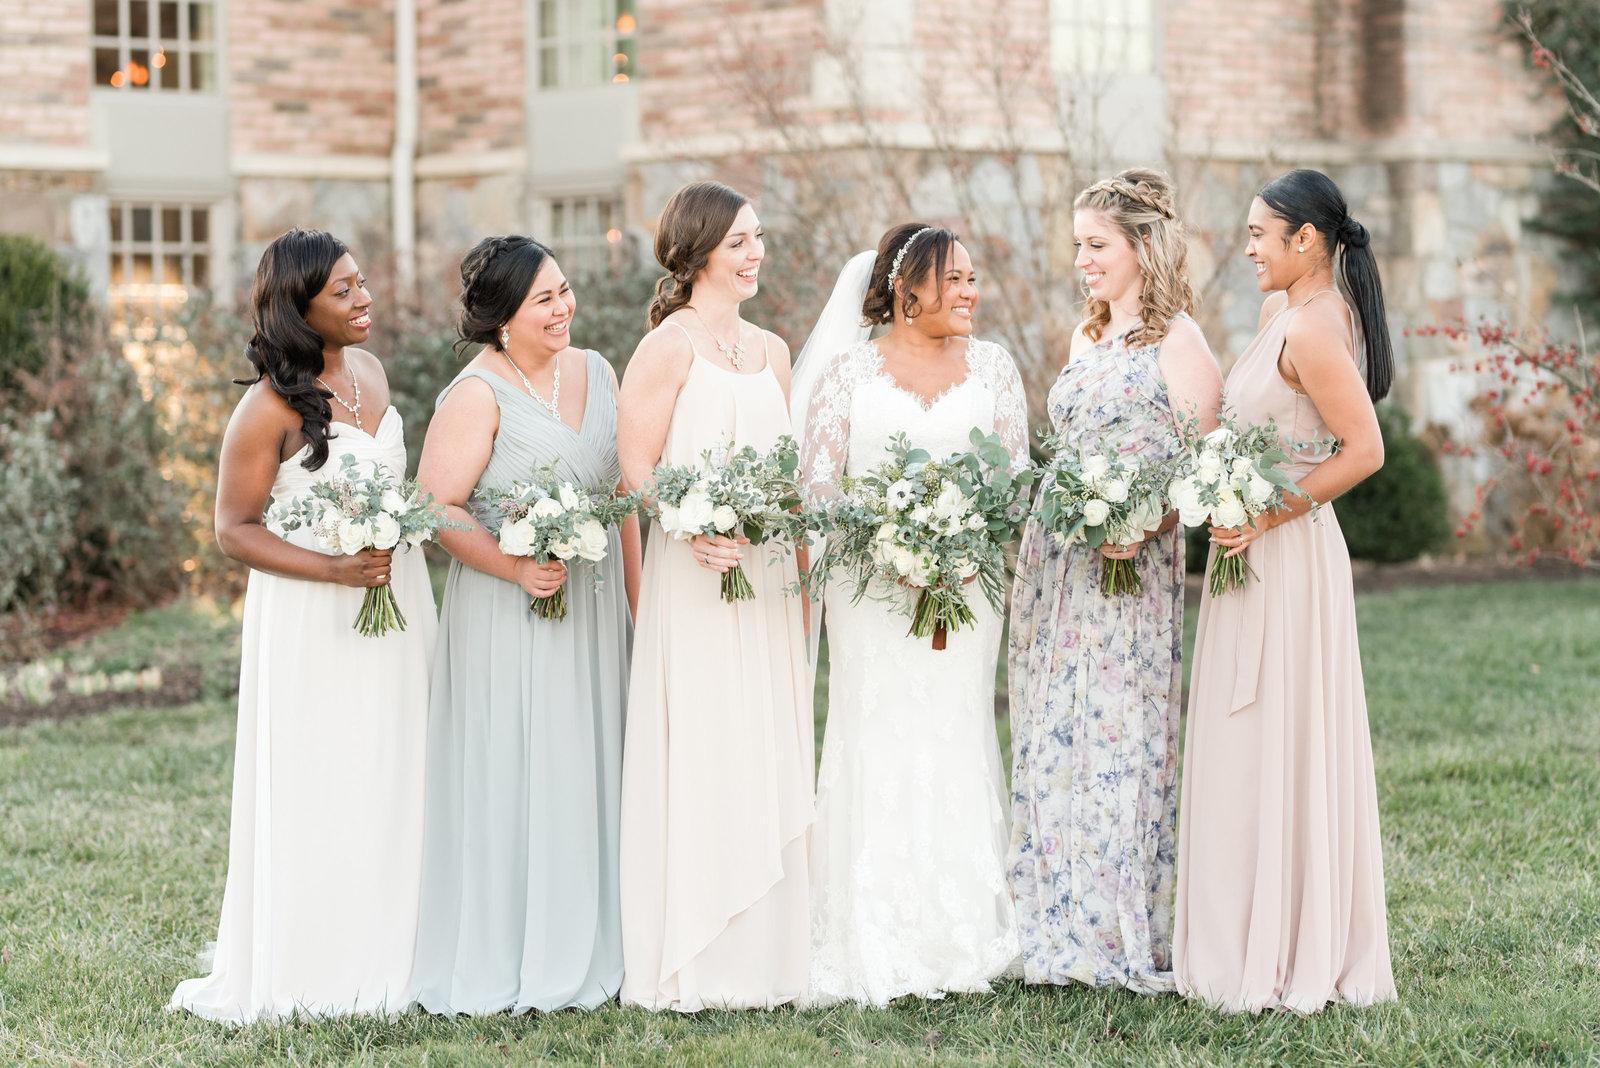 Charlottesville Va Wedding Pastel Bridesmaids Dresses By Virginia